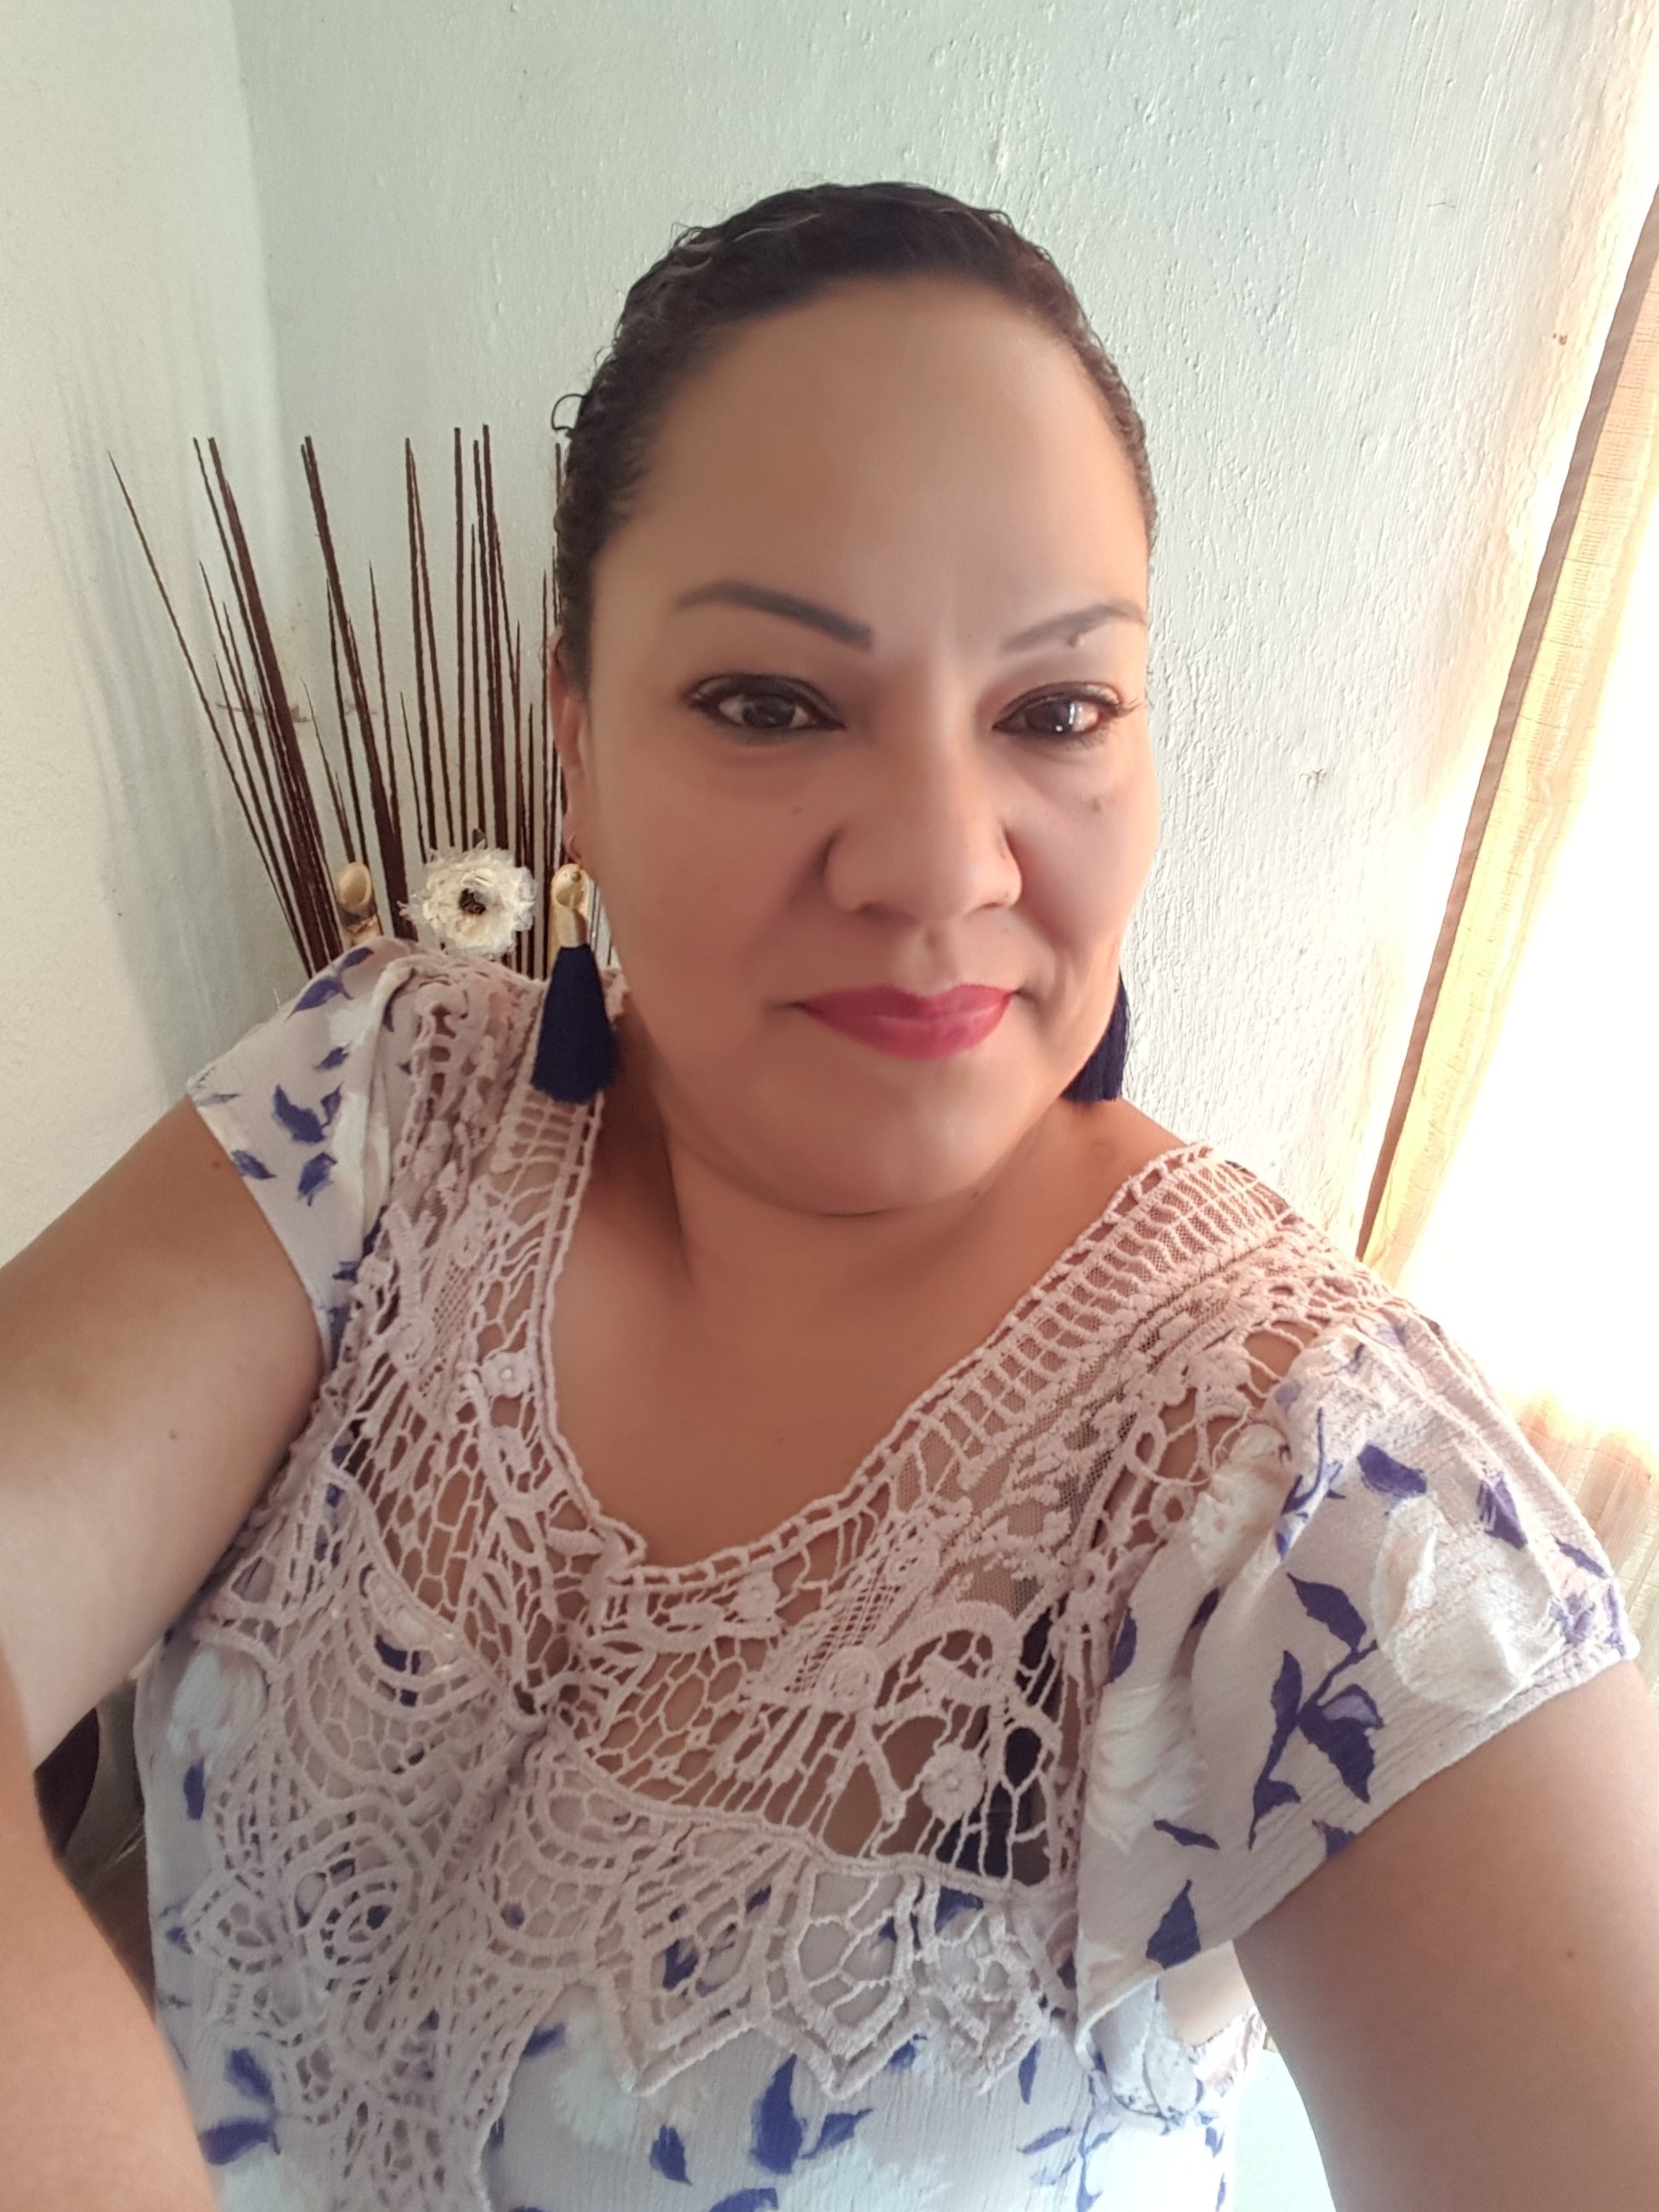 Araceli Garcia